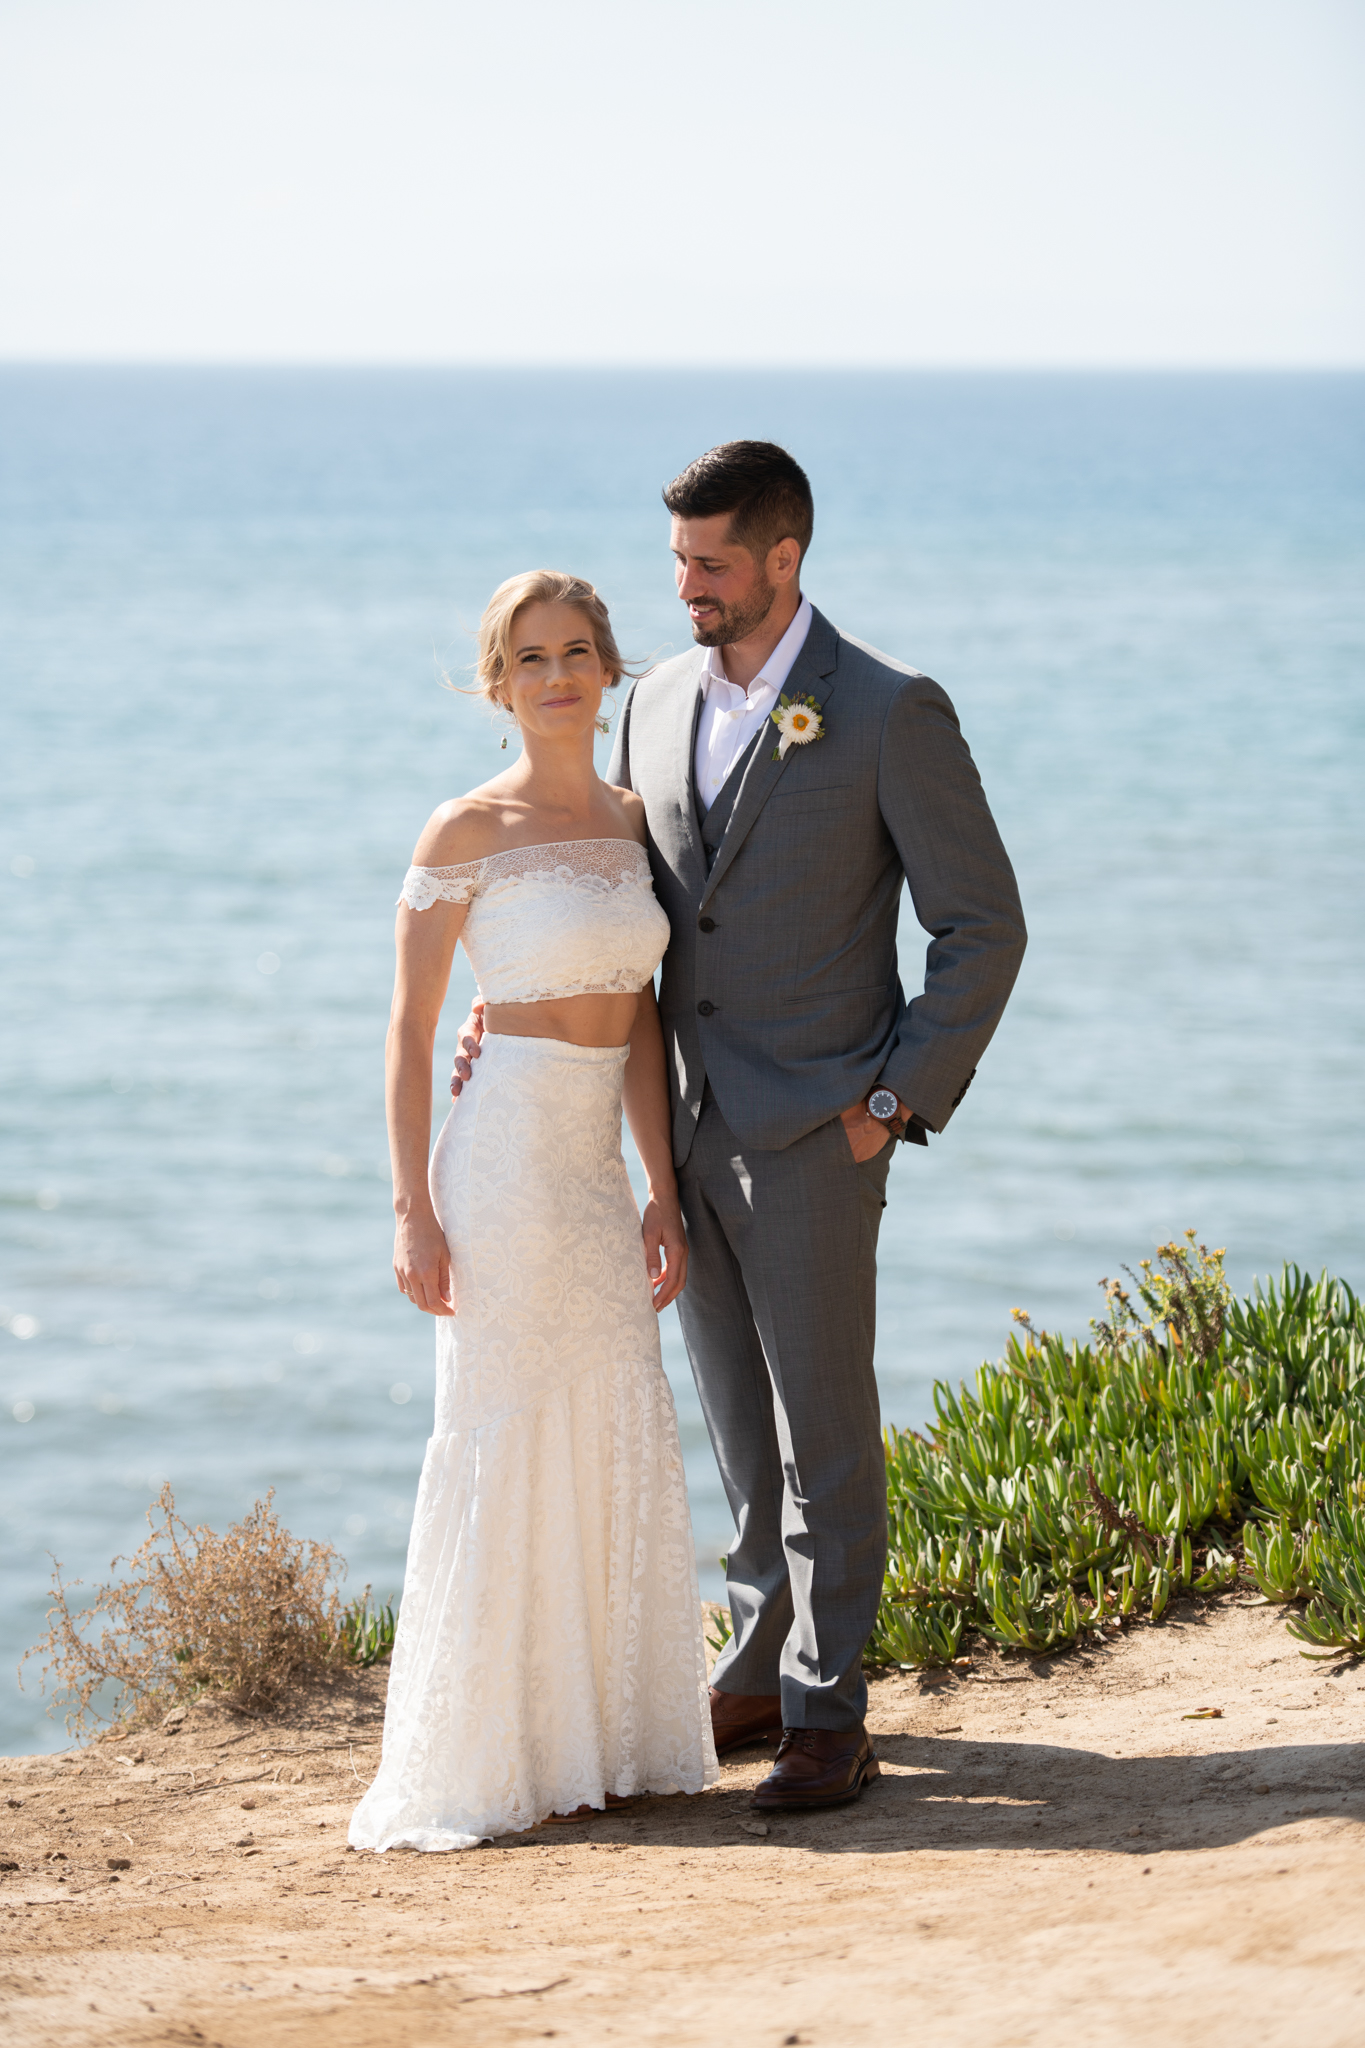 09_PRVW_Jenny_Ken_Wedding_Trevor_Hooper_Photo.jpg